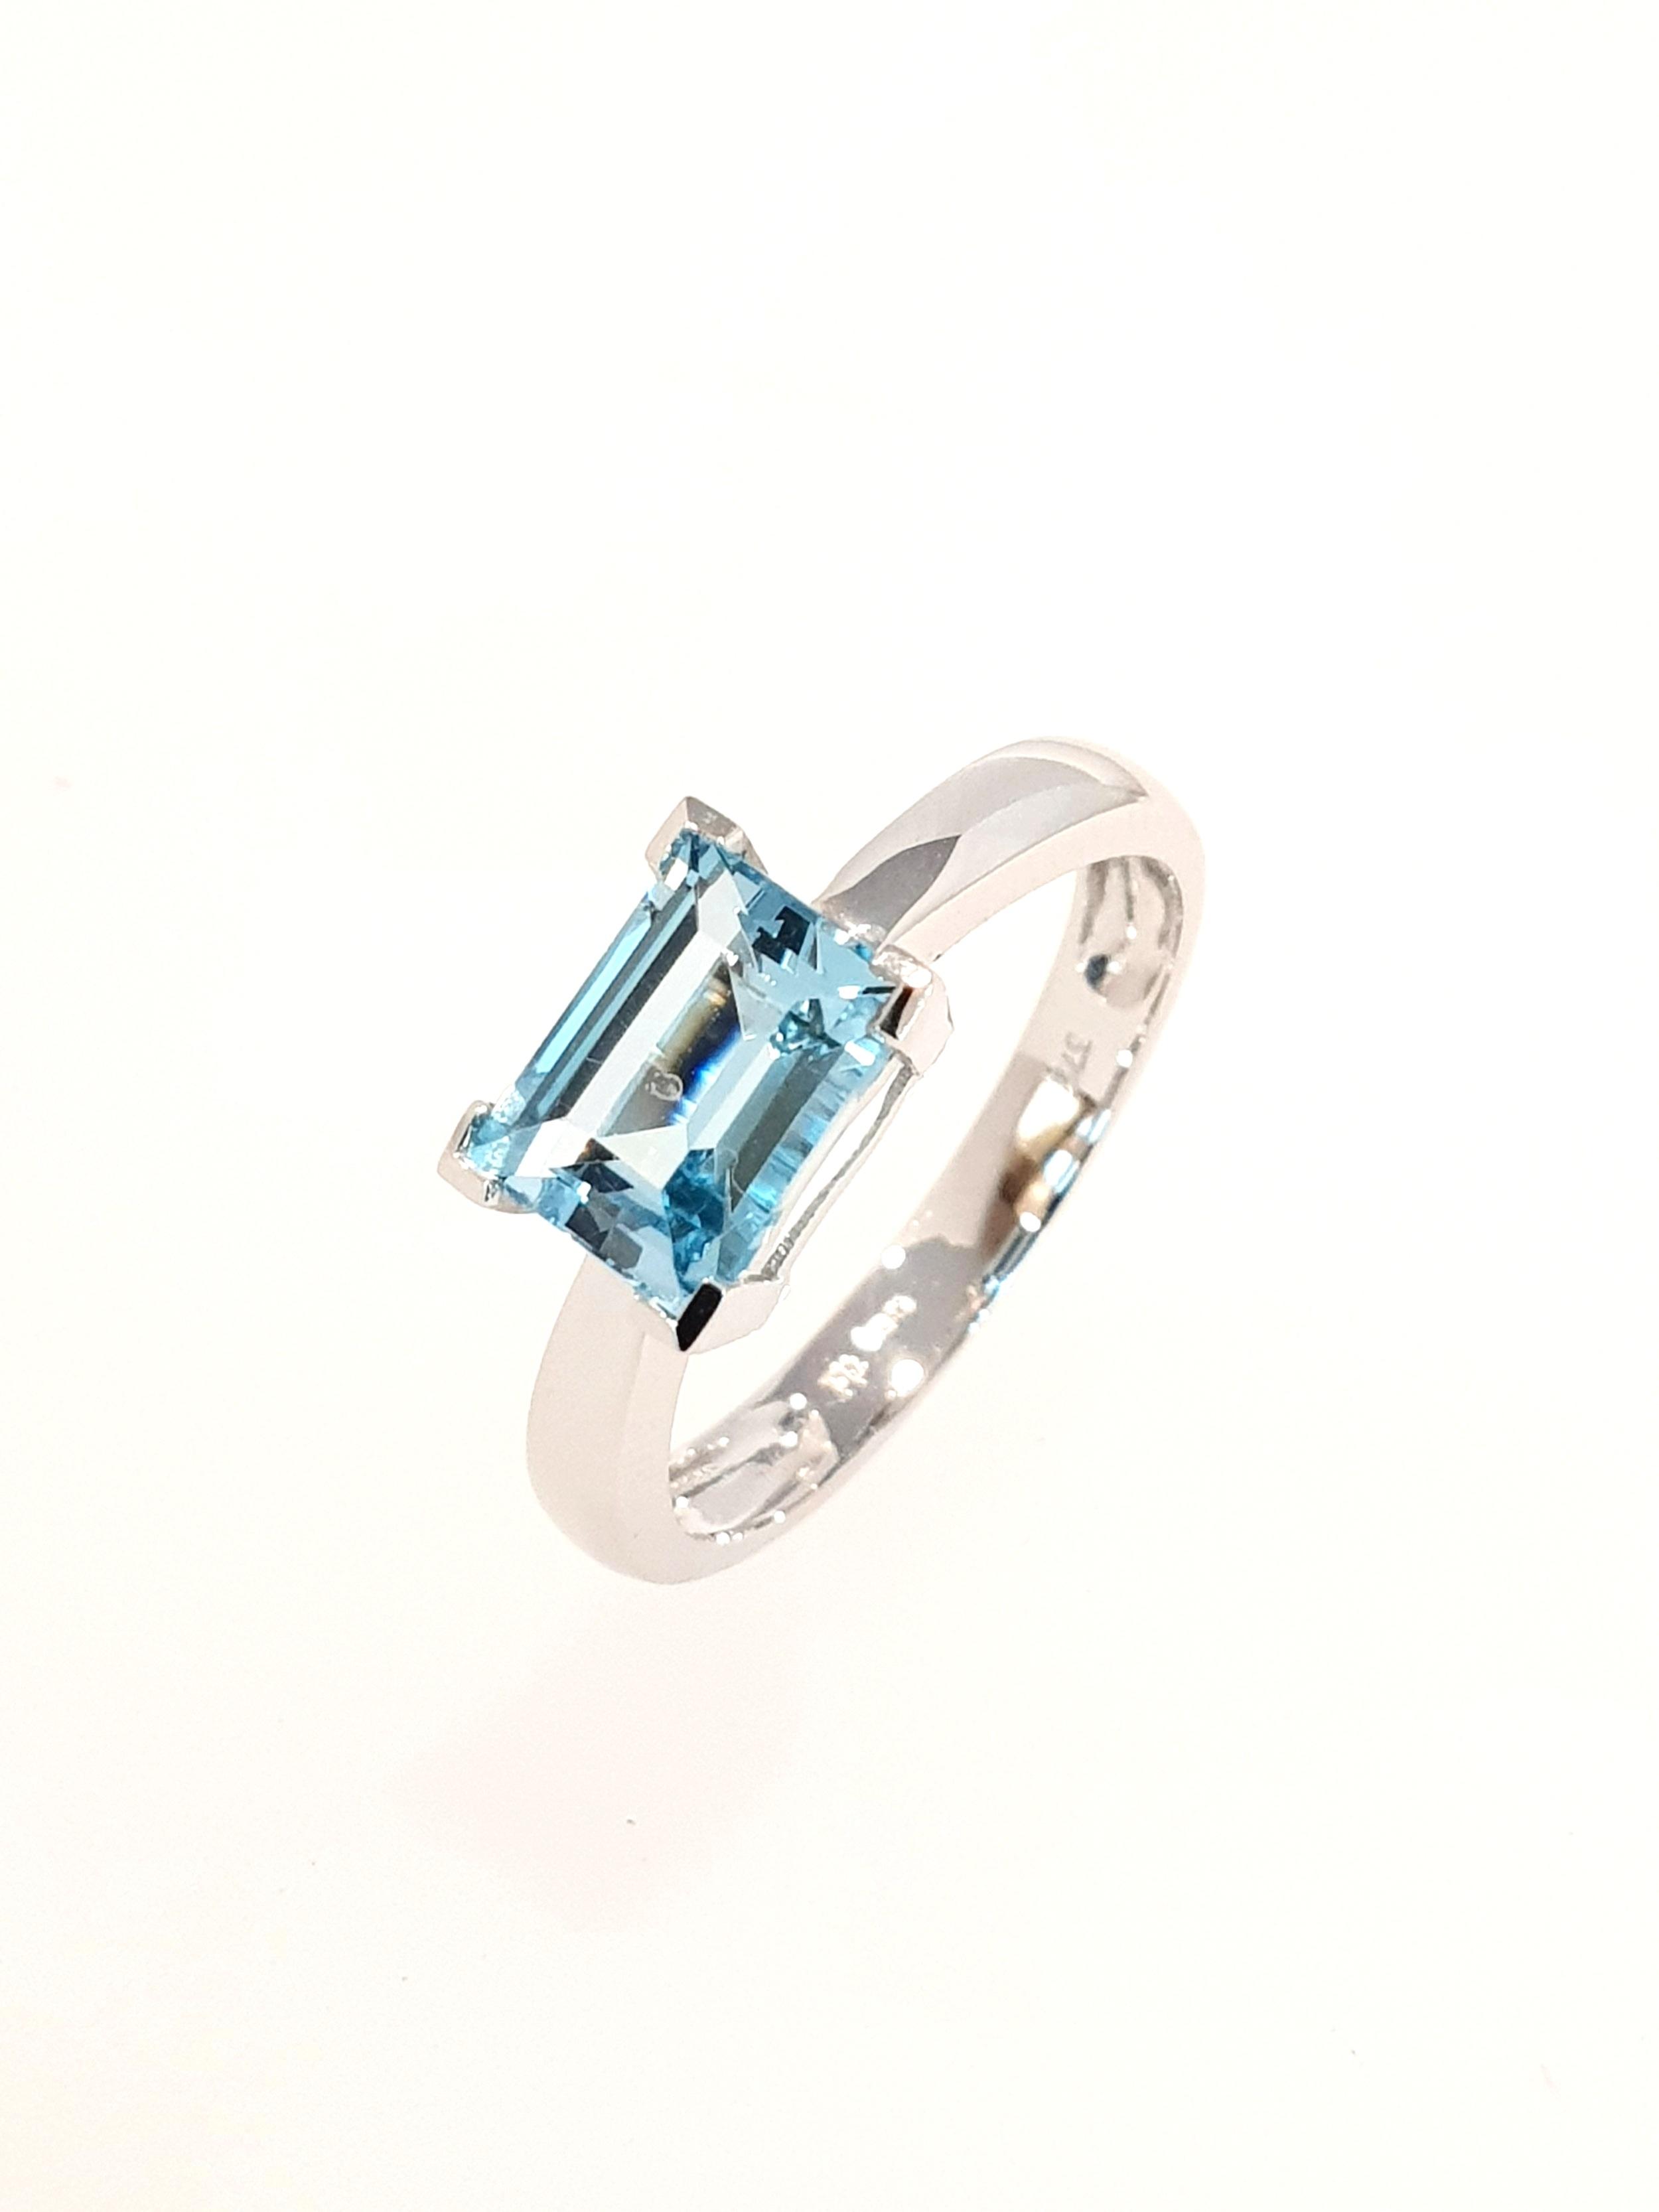 9ct White Gold Blue Topaz Ring SOLD  Stock Code: G1964  £300